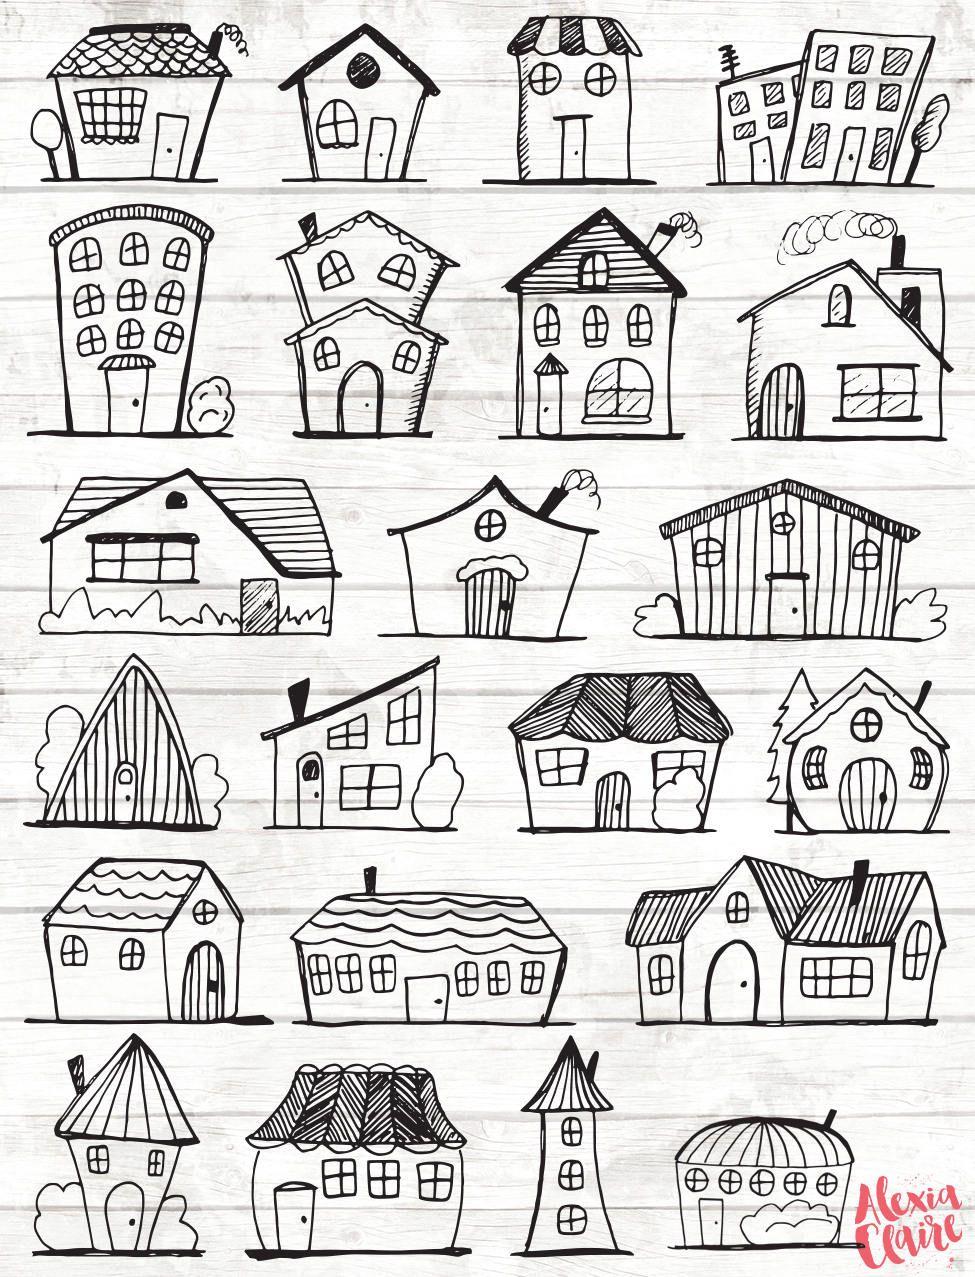 House vector art home. Houses clipart doodle